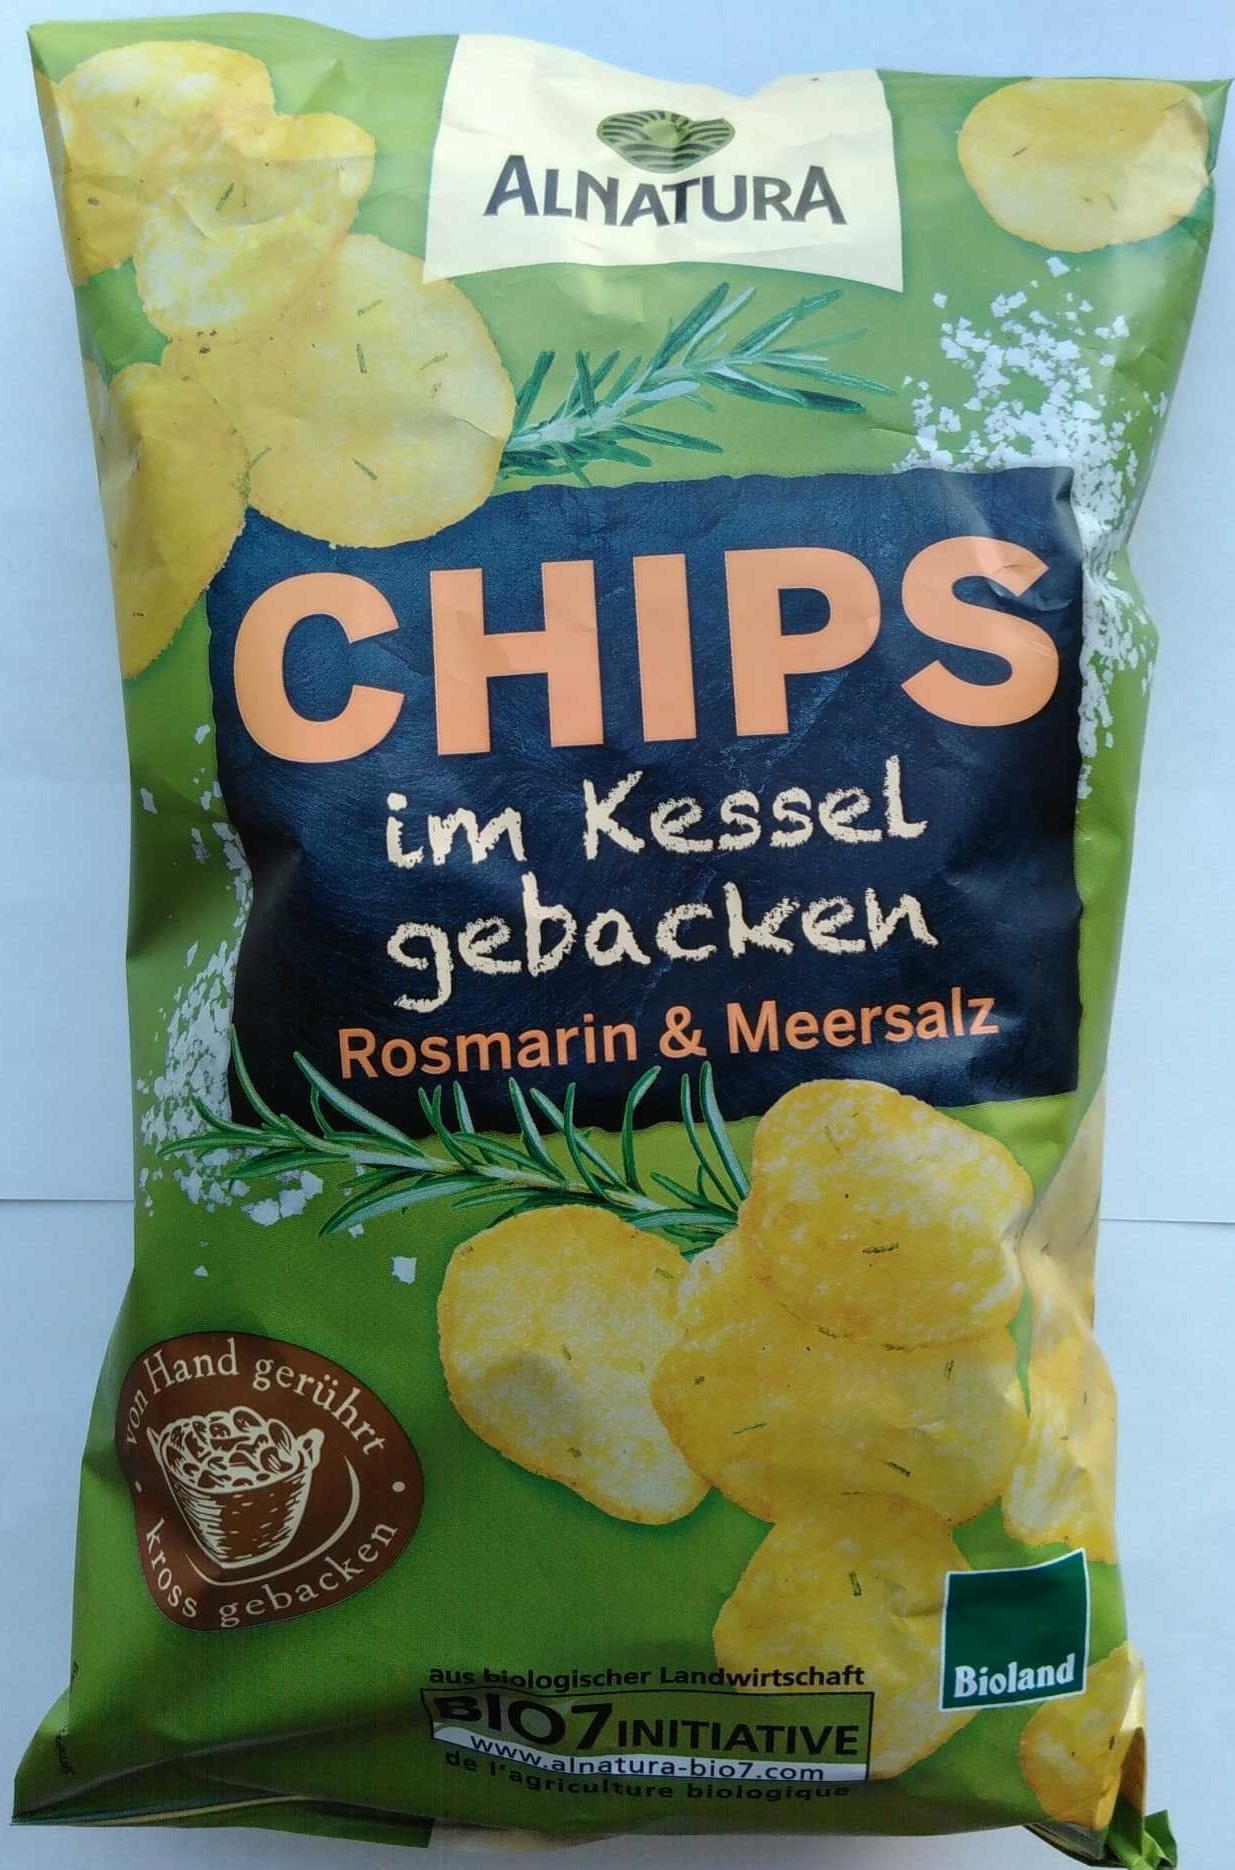 Chips im Kessel gebacken Rosmarin & Meersalz - Prodotto - de